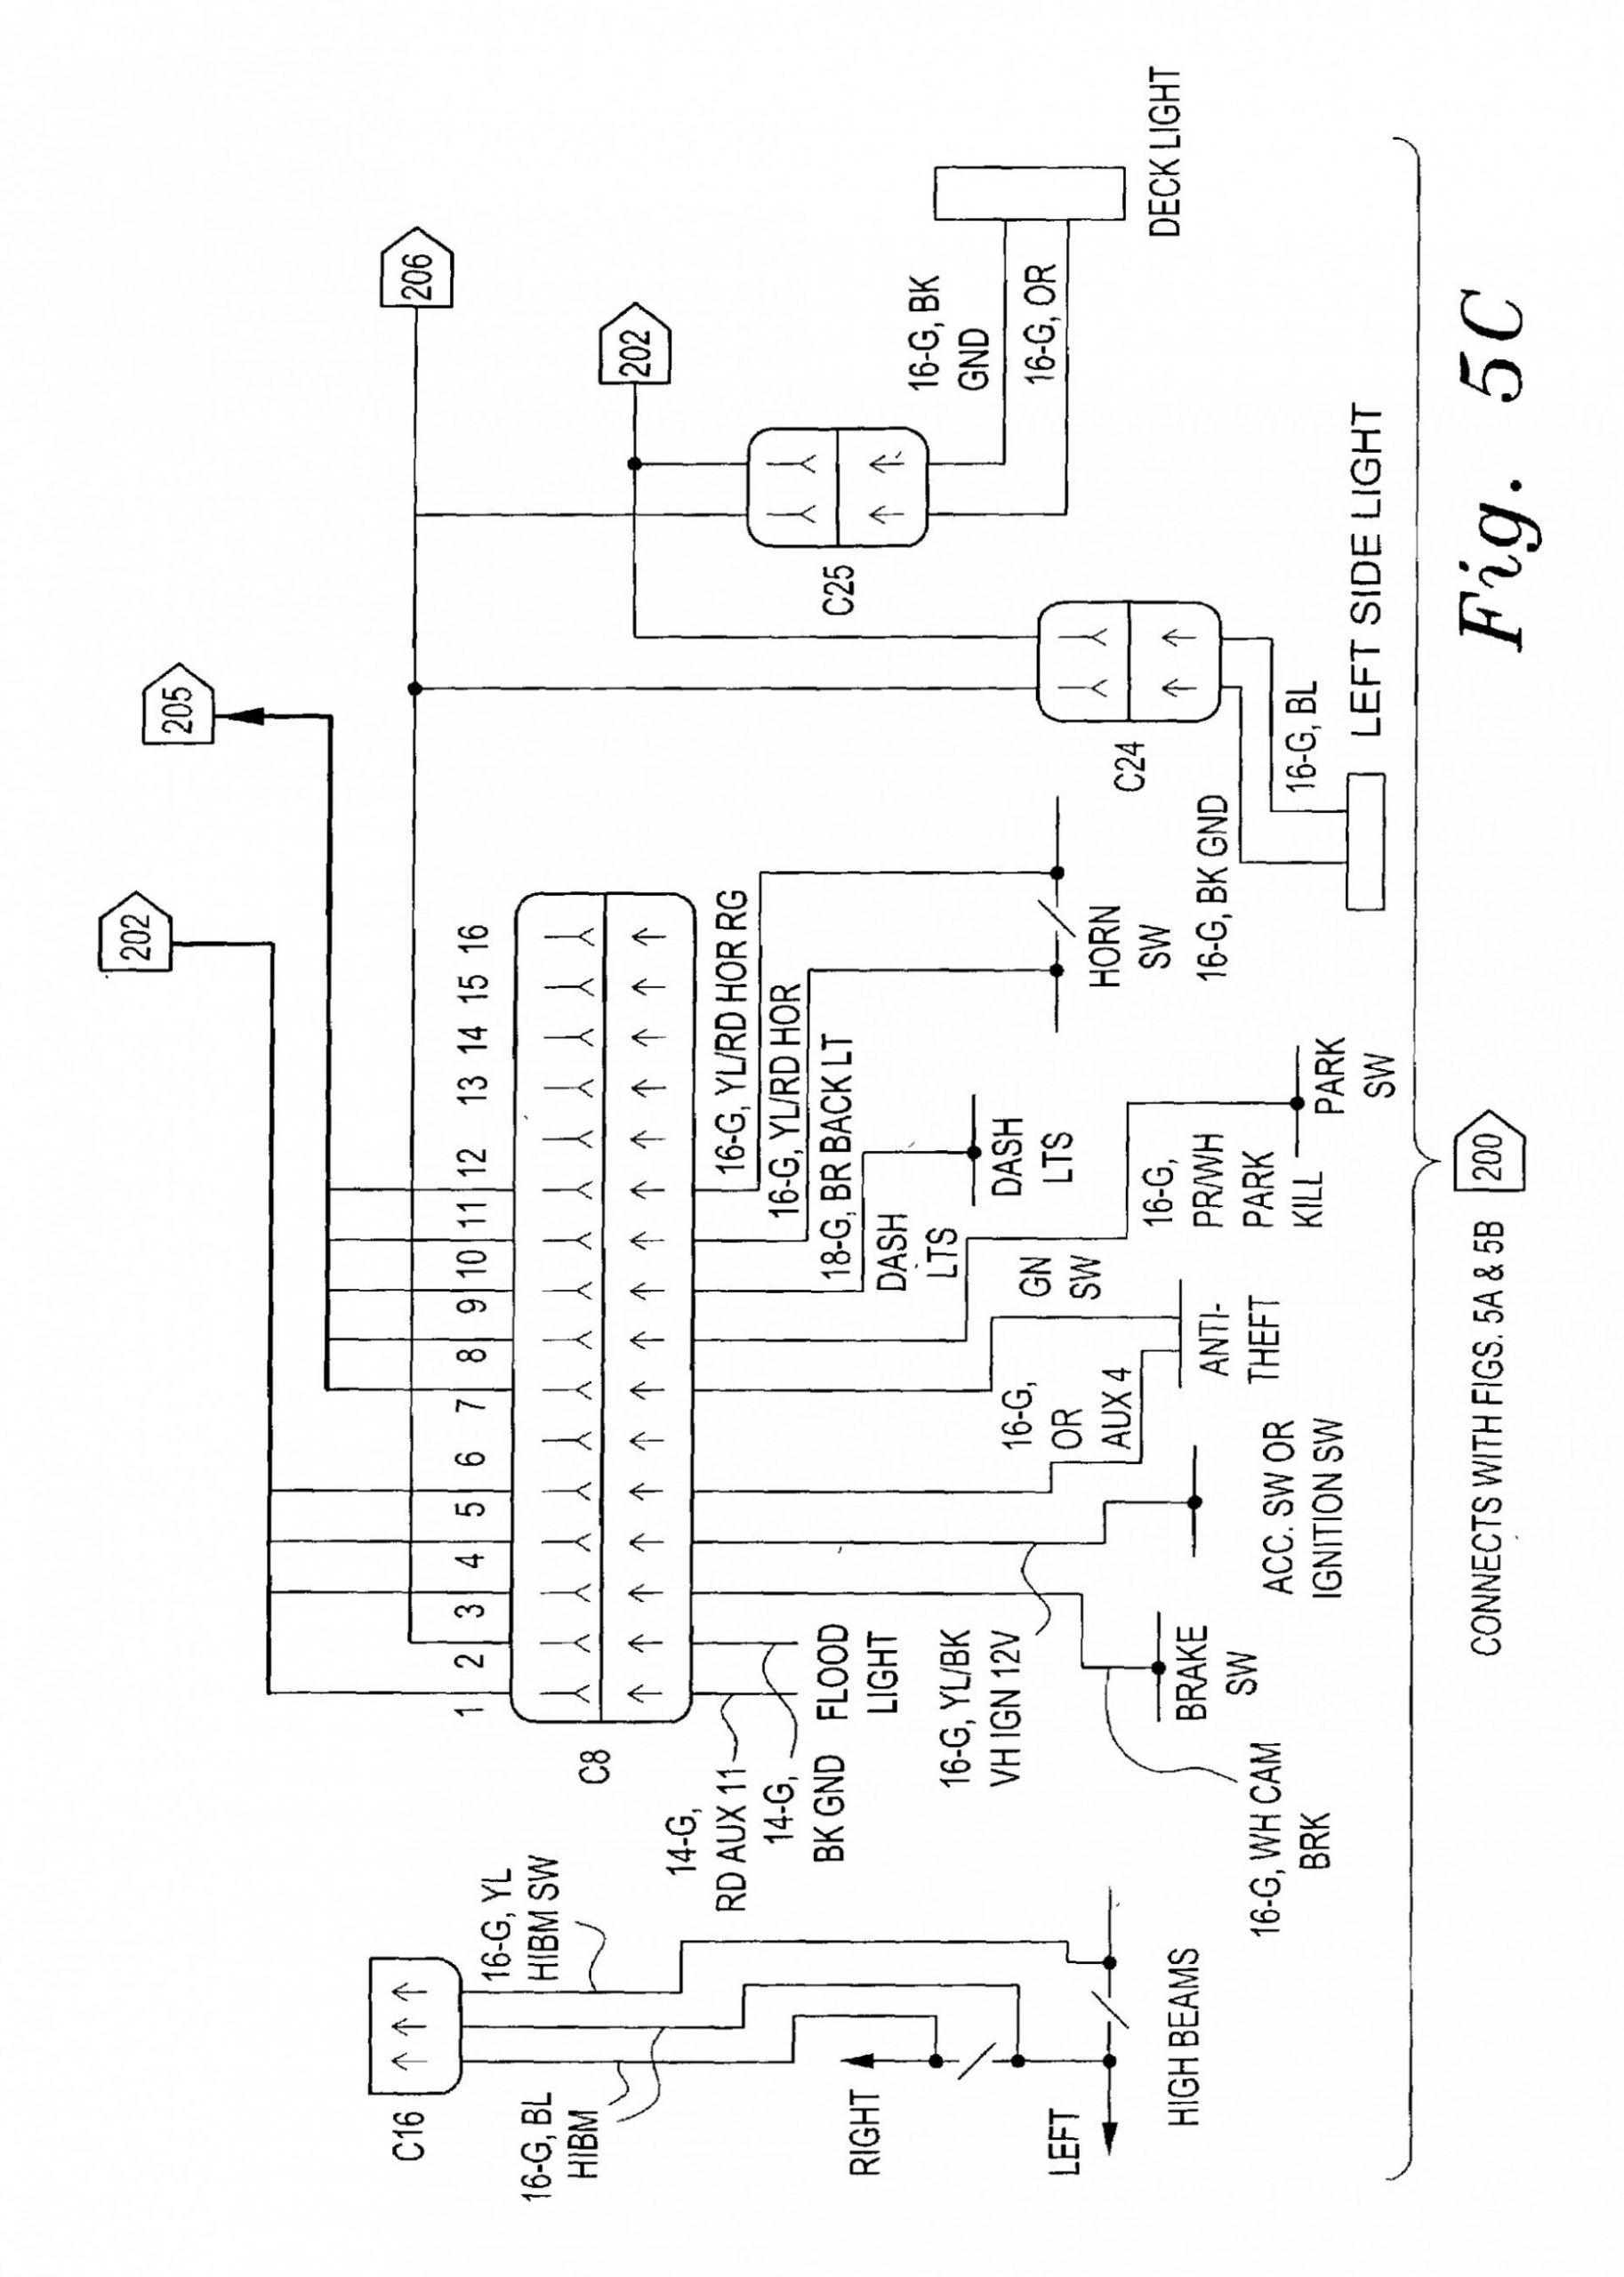 2007 Nissan Titan Radio Wiring Diagram